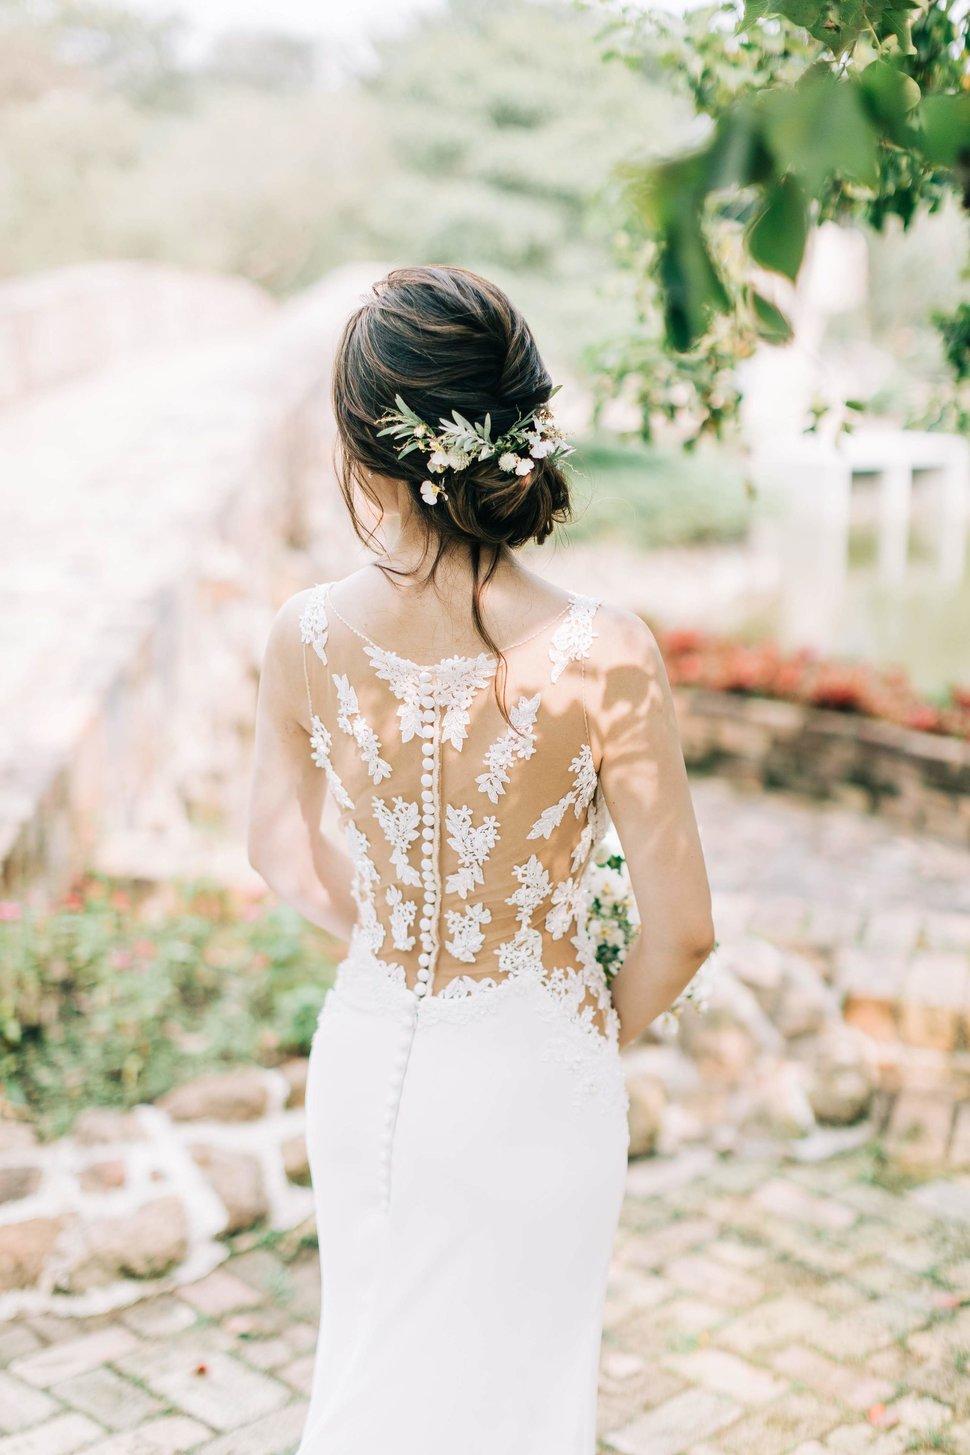 AG3_6792A - Cradle Wedding搖籃手工婚紗《結婚吧》